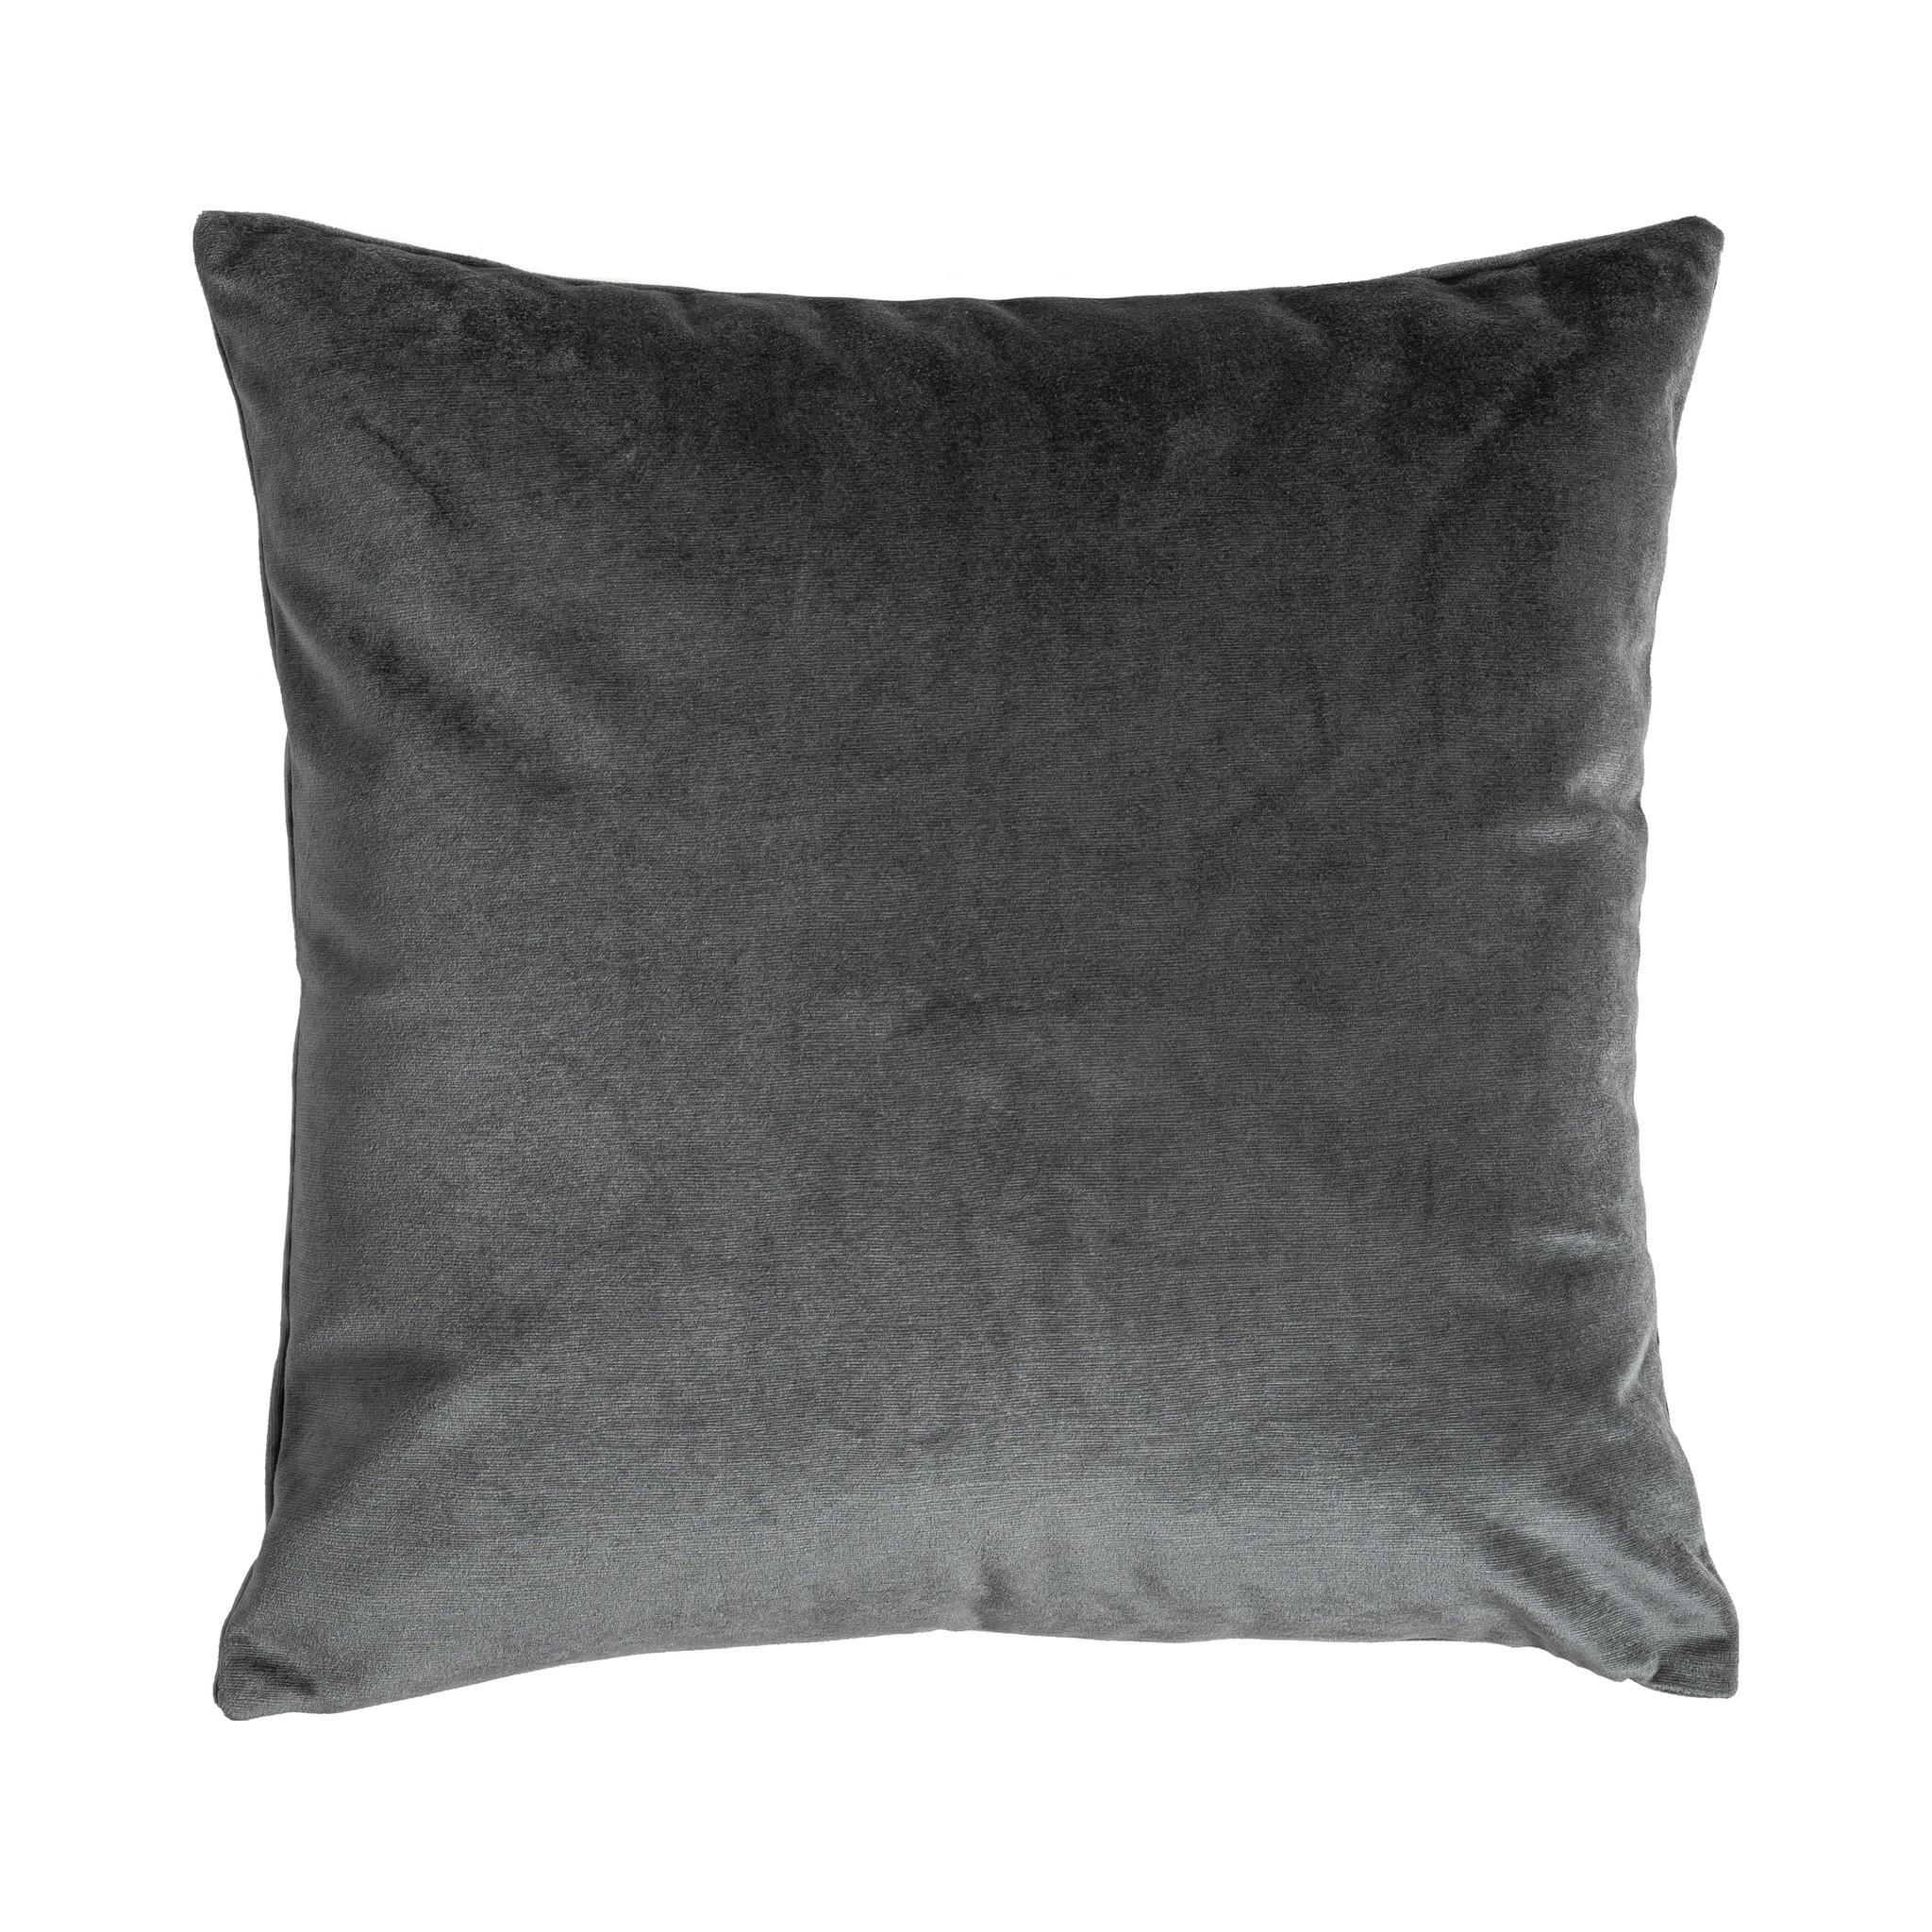 Presence Sierkussenhoes Nola - Antraciet 45 x 45 cm